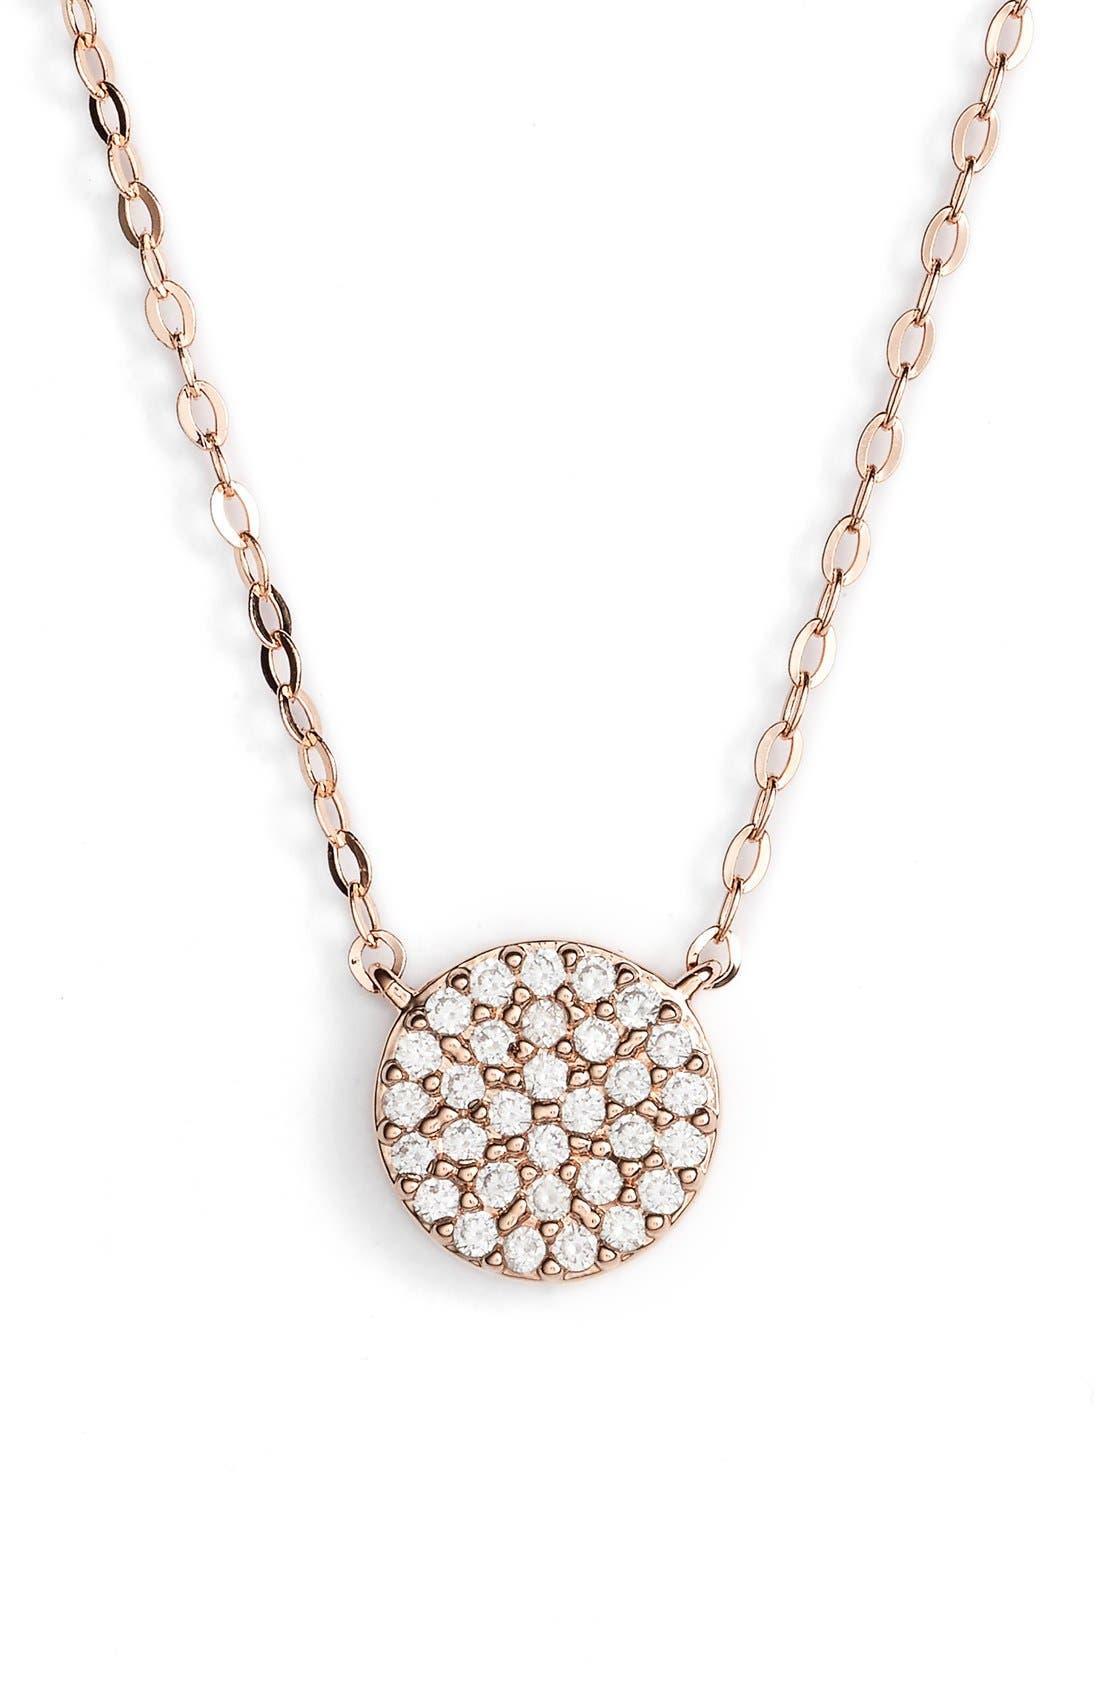 Nadri 'Geo' Small Pendant Necklace